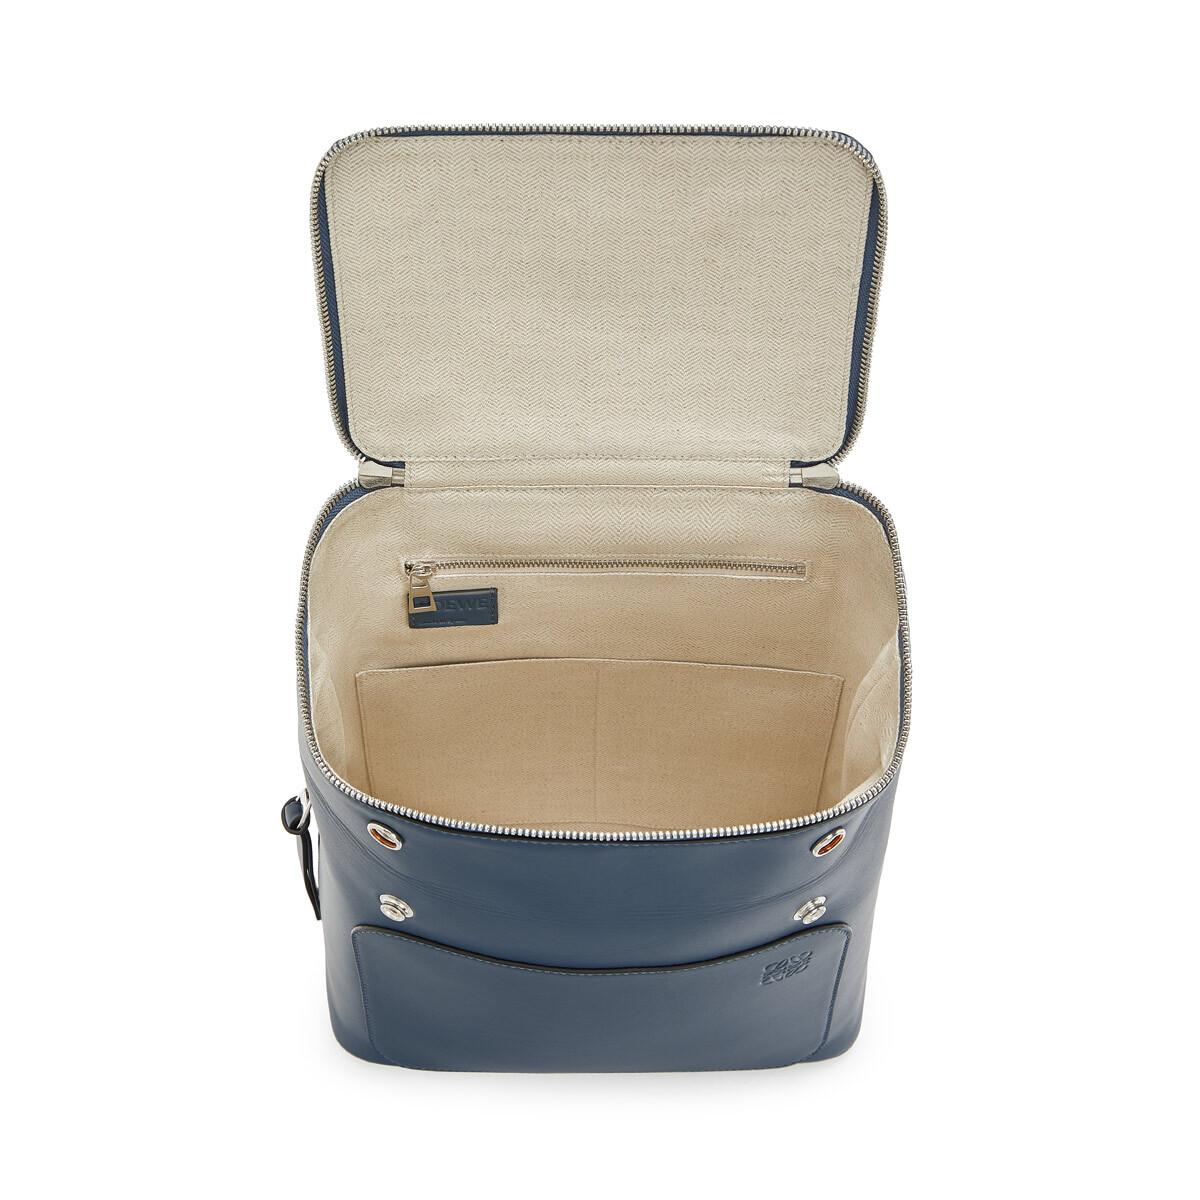 LOEWE Goya Small Backpack Steel Blue front